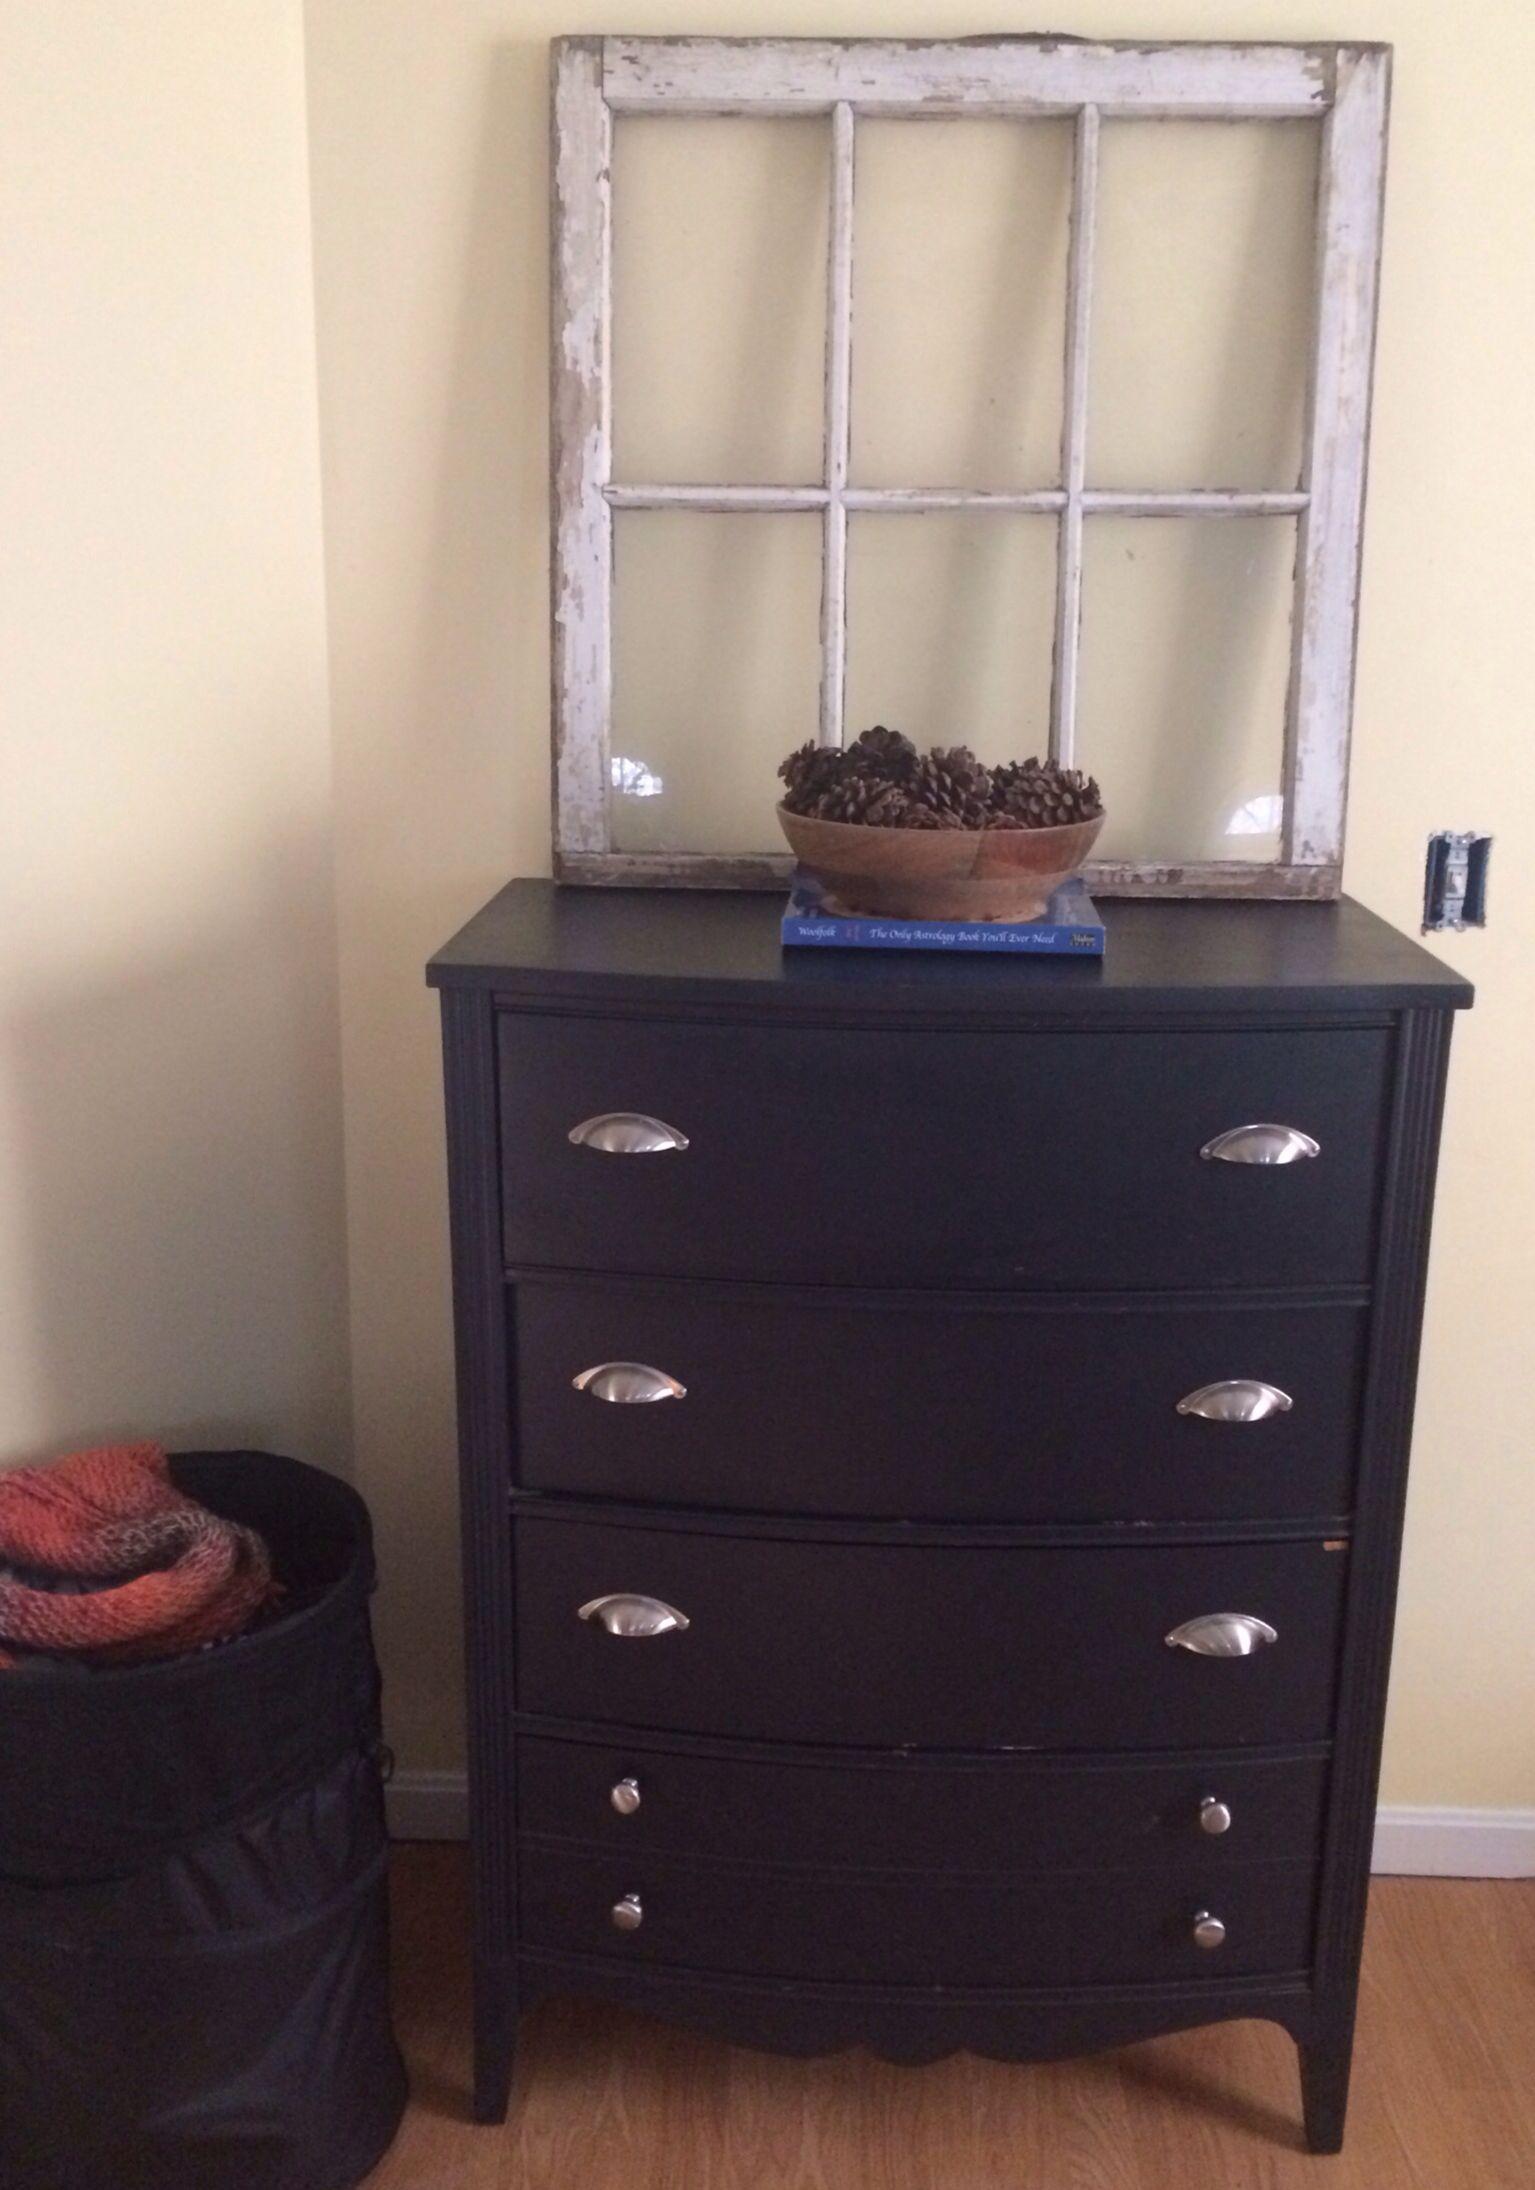 Bedroom furniture antique window repainted dresser and new pulls